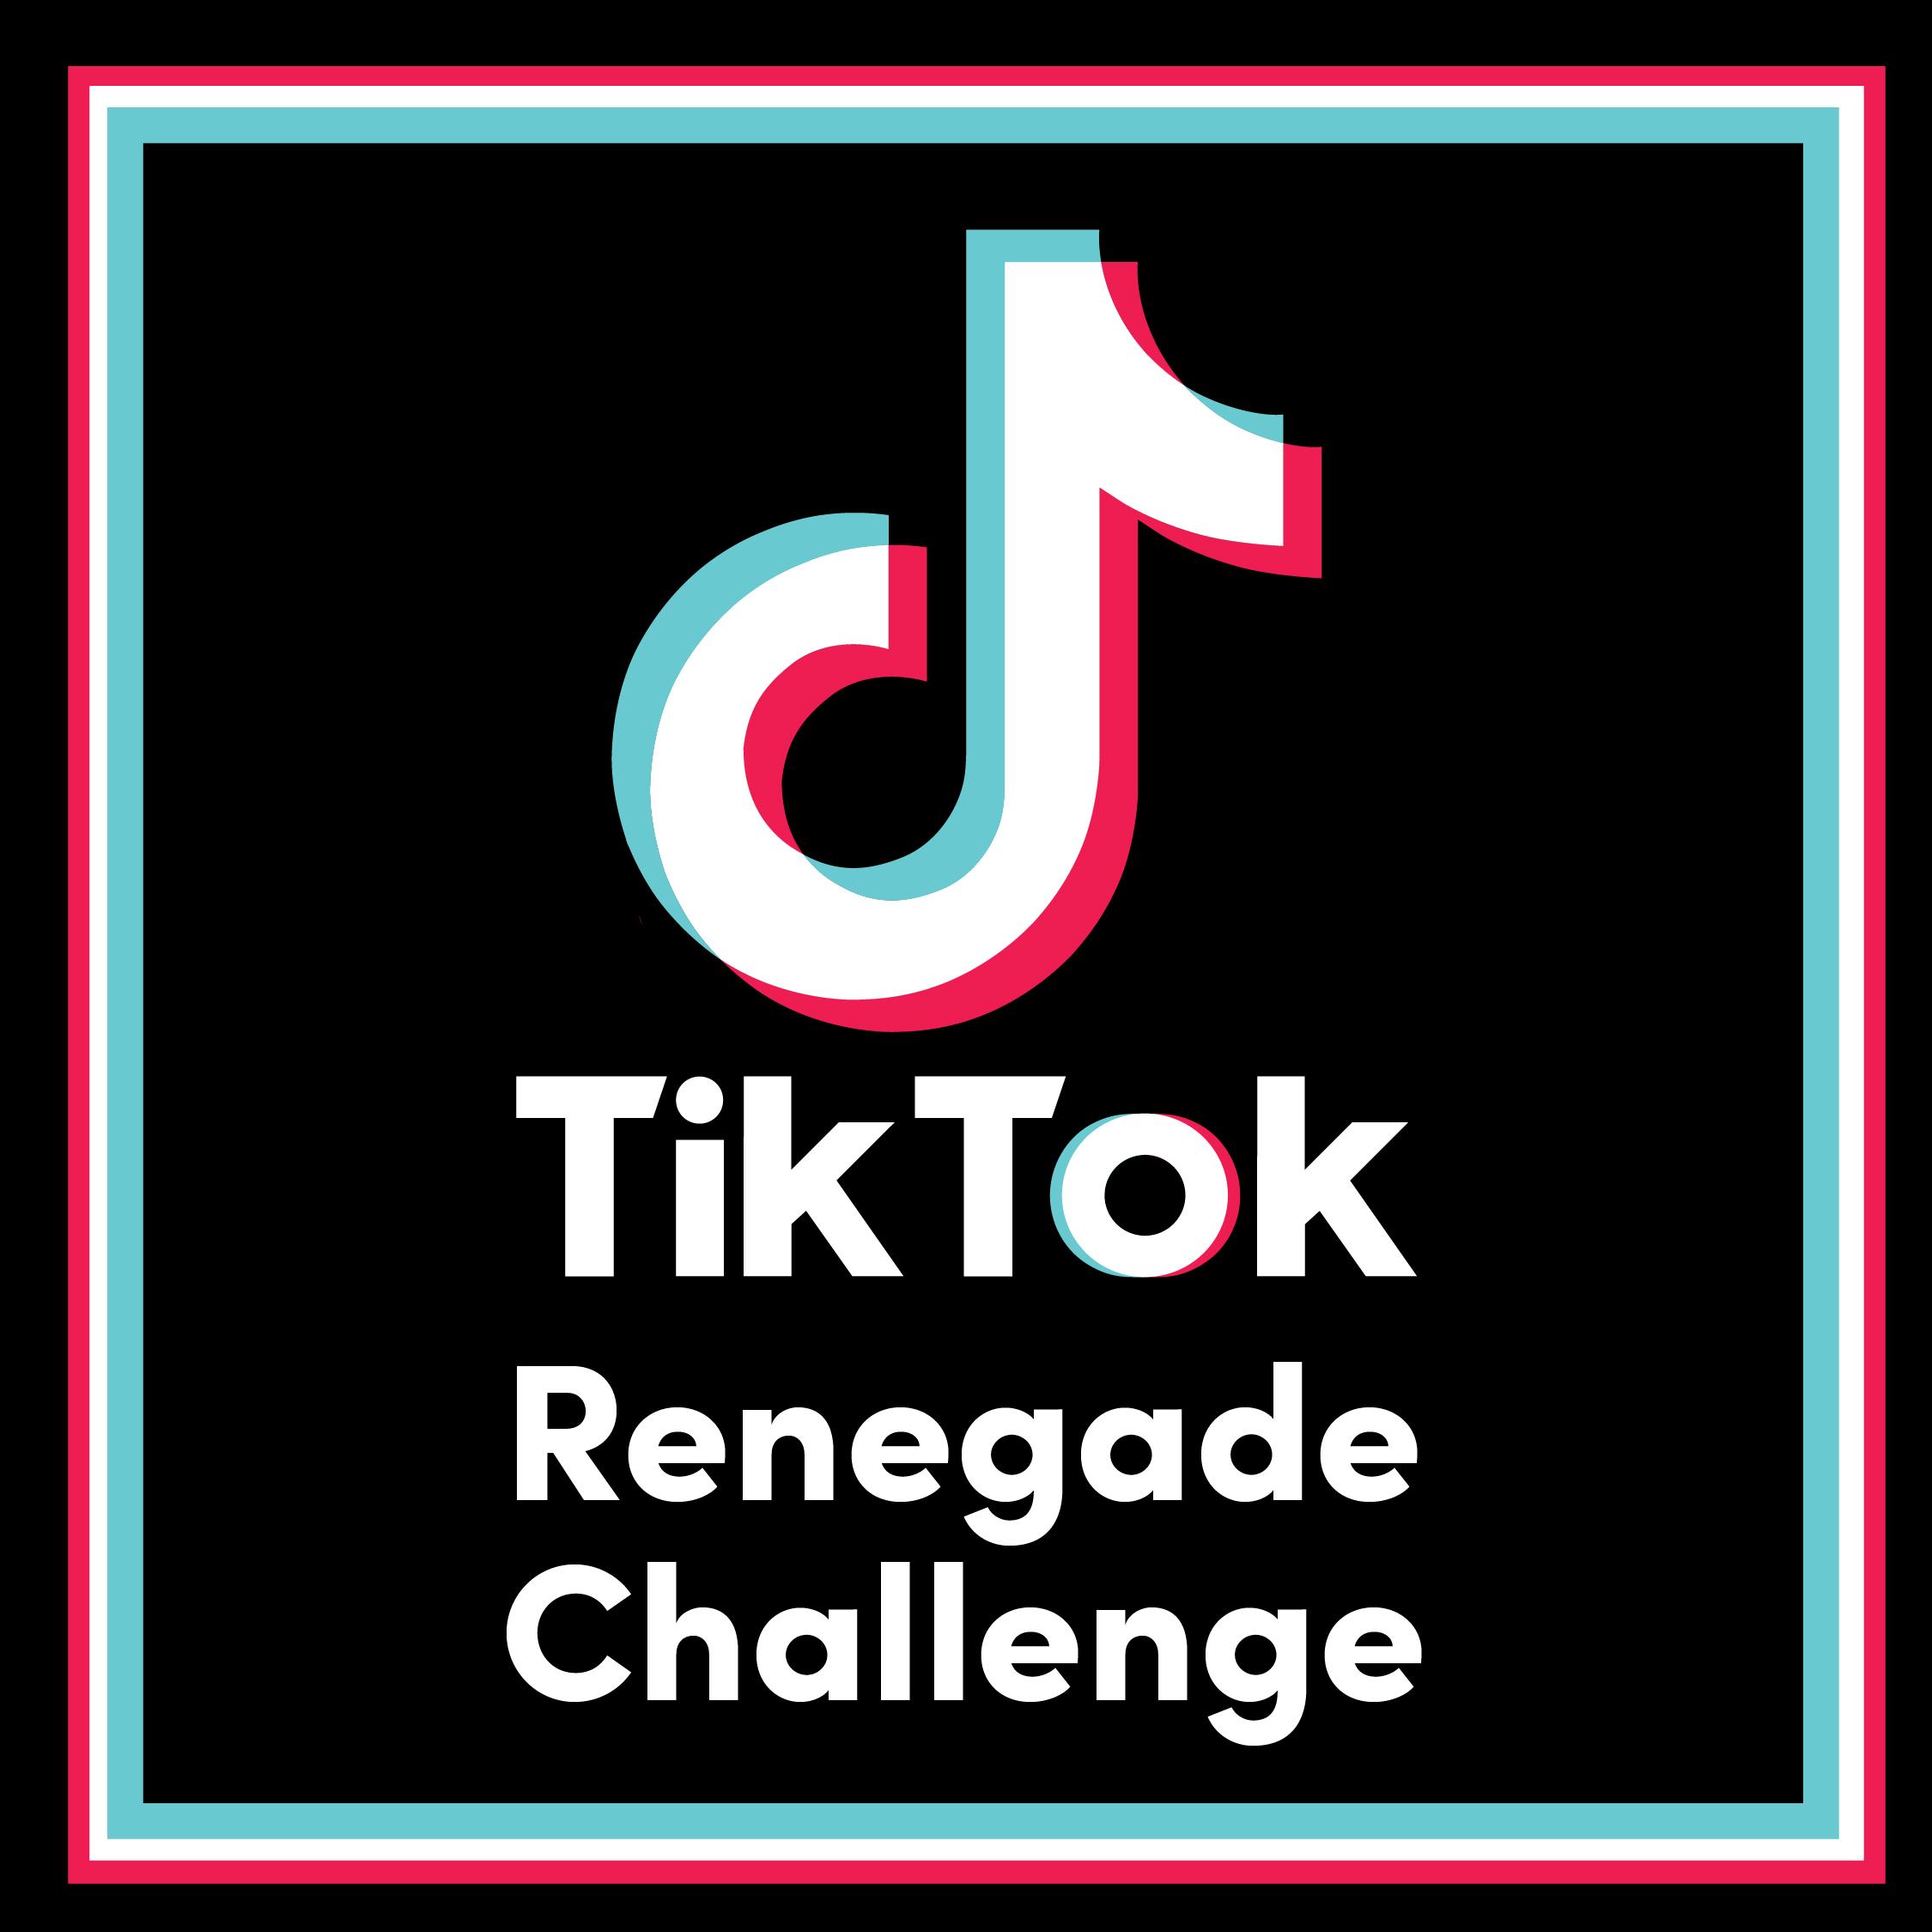 TikTok Renegade Challenge